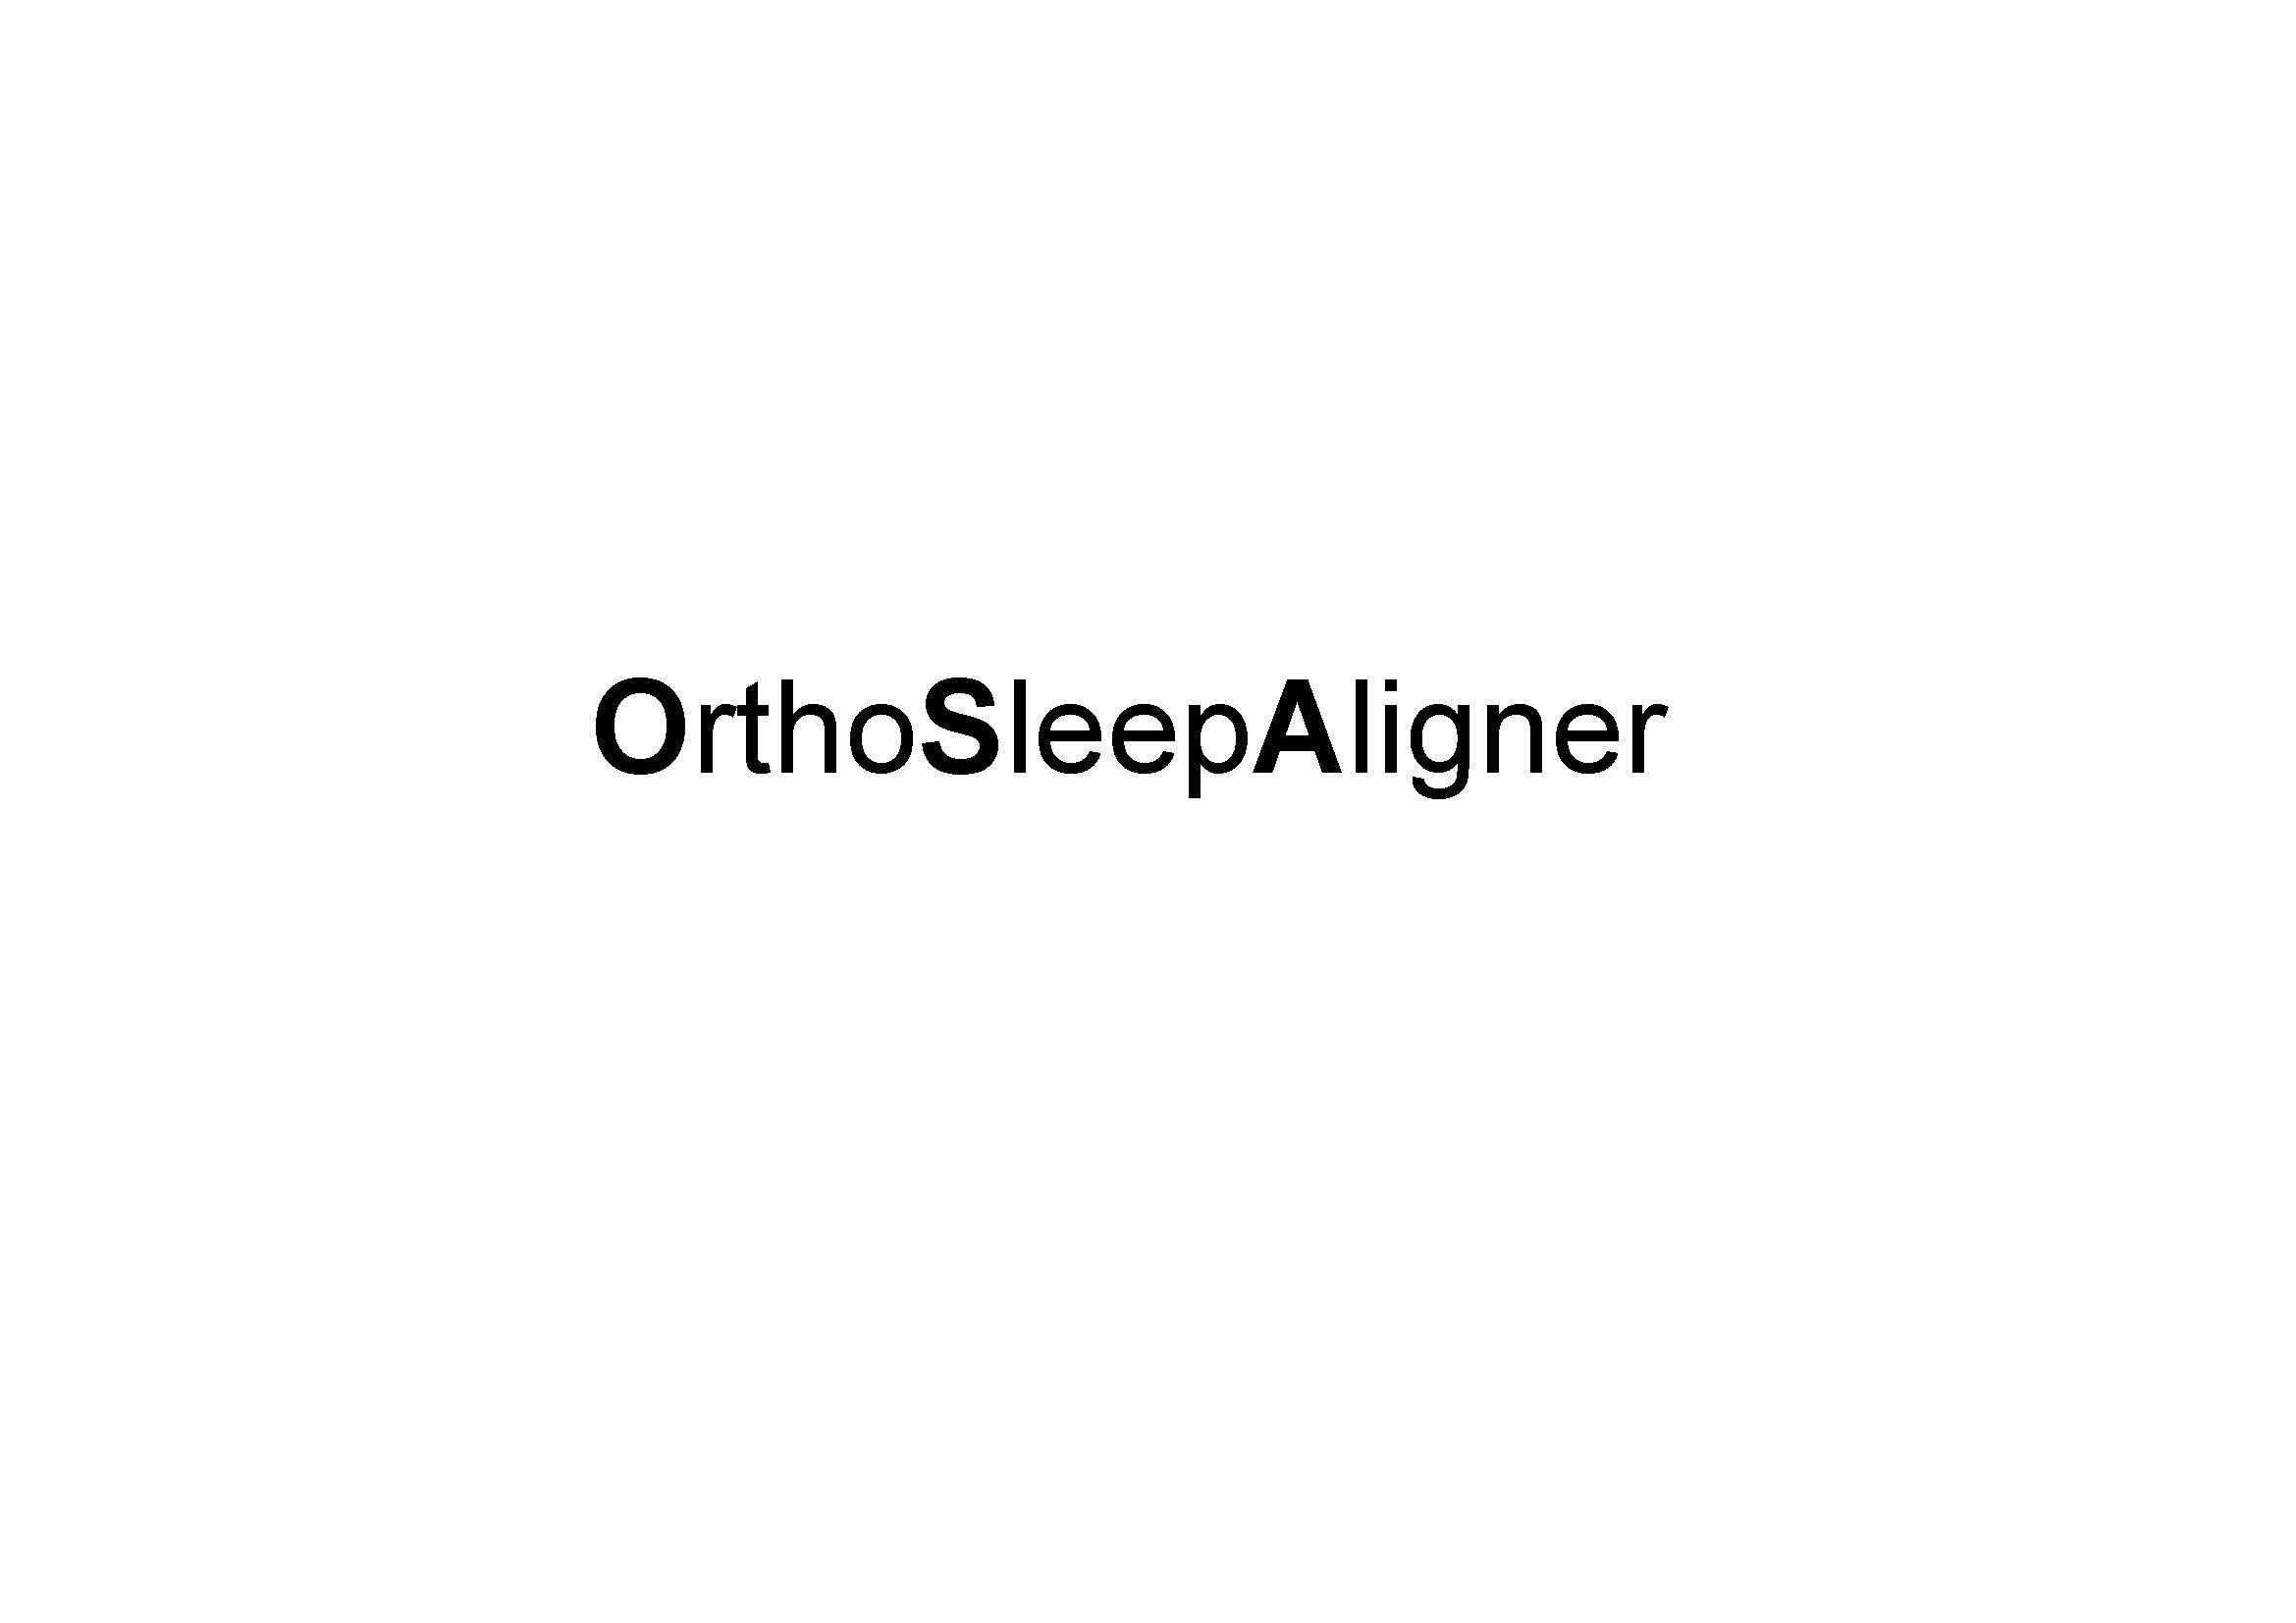 OrthoSleepAligner